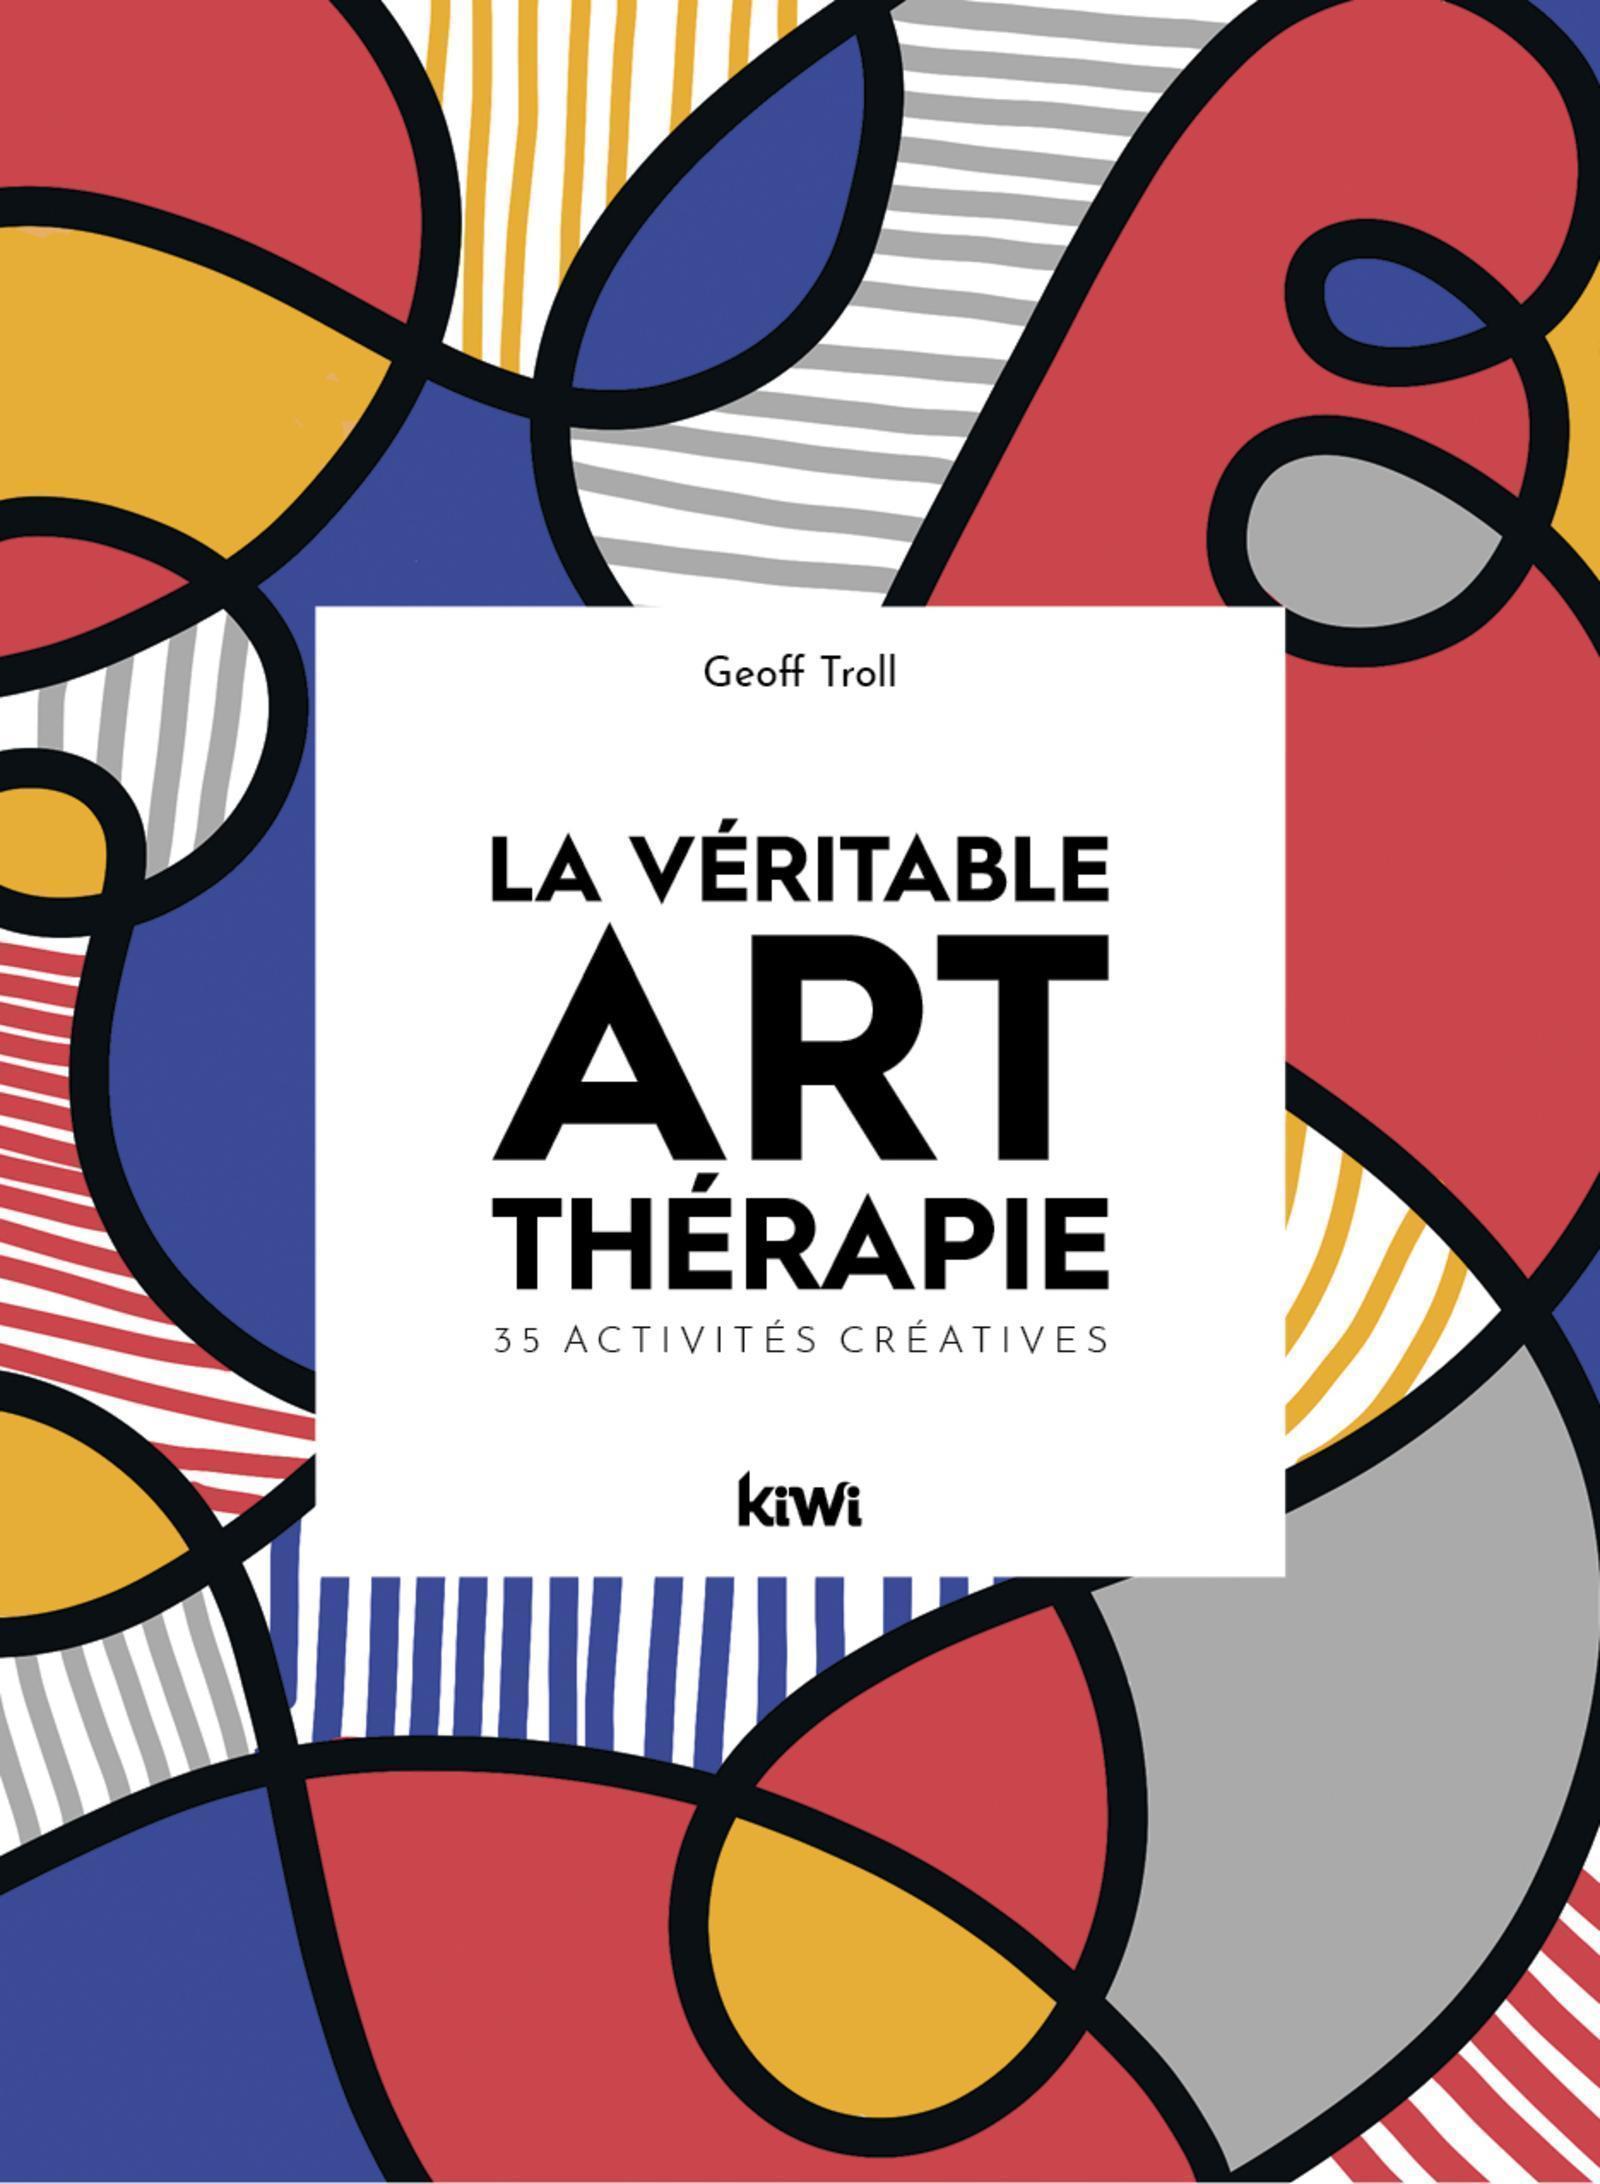 LA VERITABLE ART-THERAPIE - 35 ACTIVITES CREATIVES